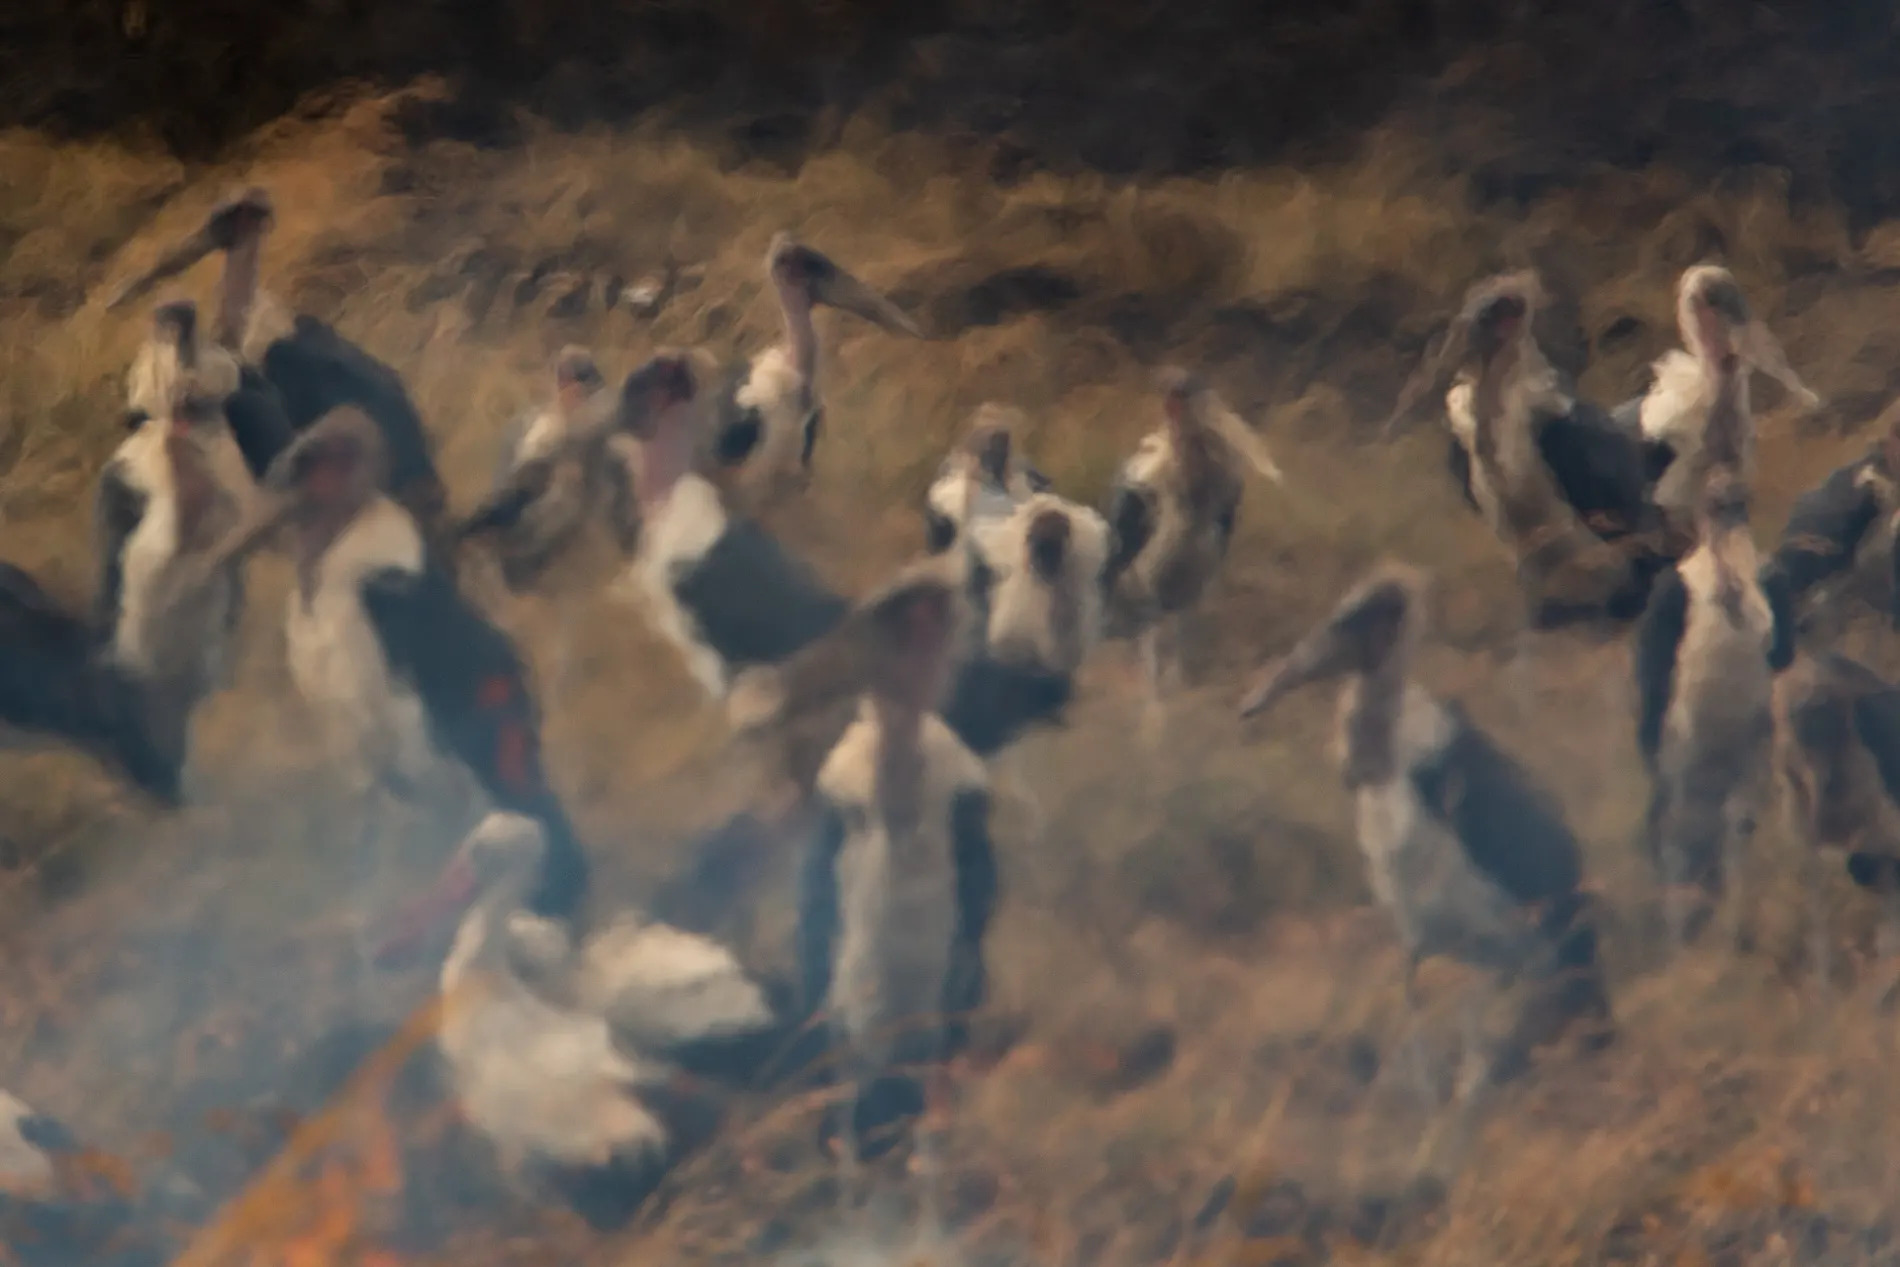 Marabou Storks in fire